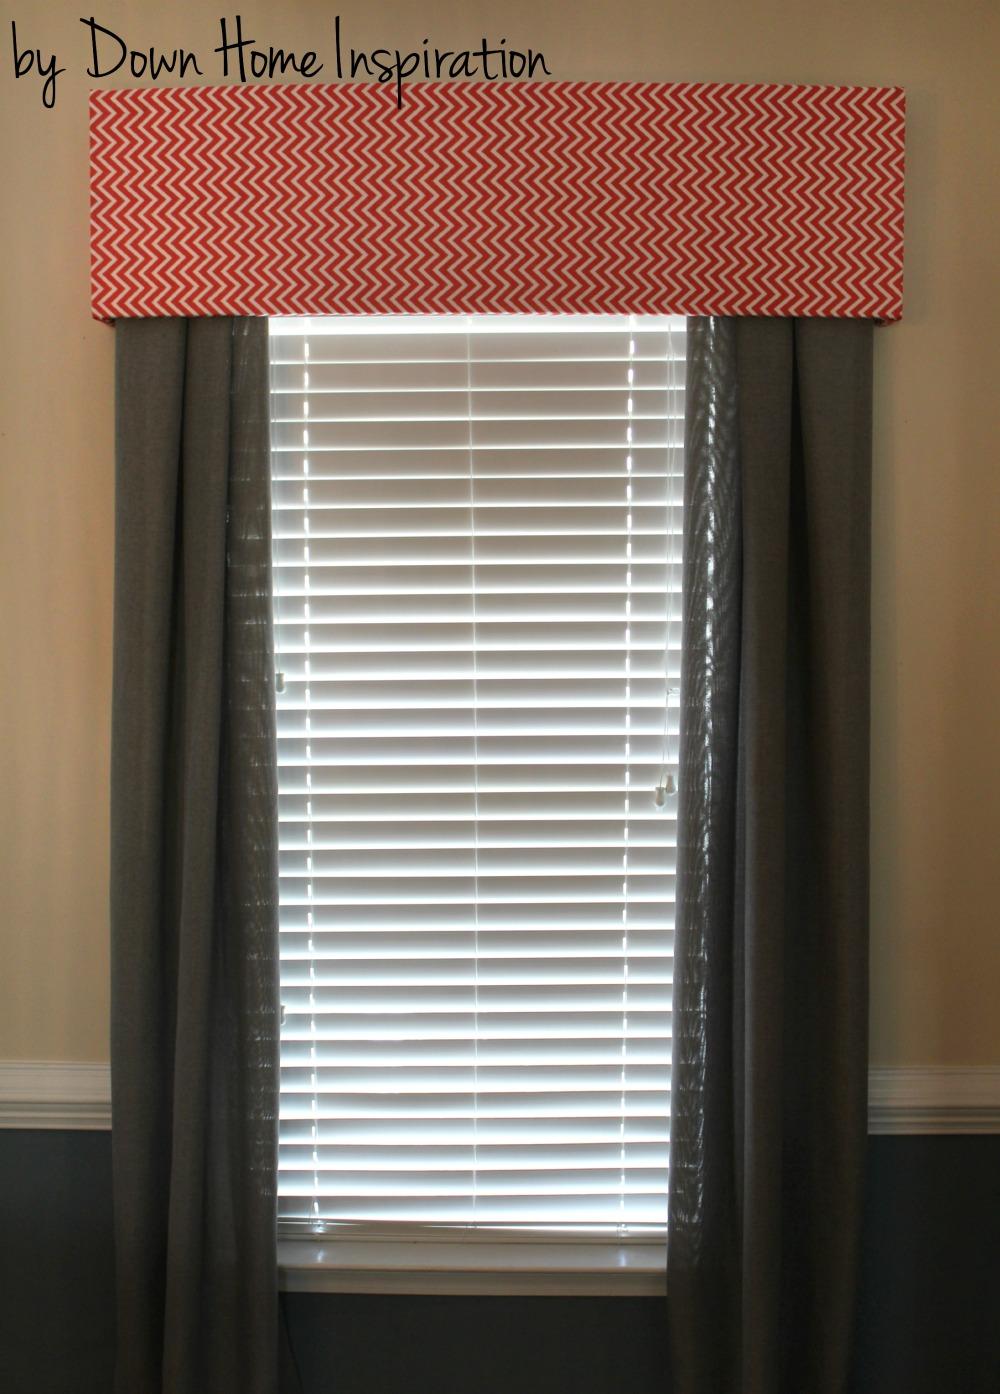 renter-friendly-window-valance-9